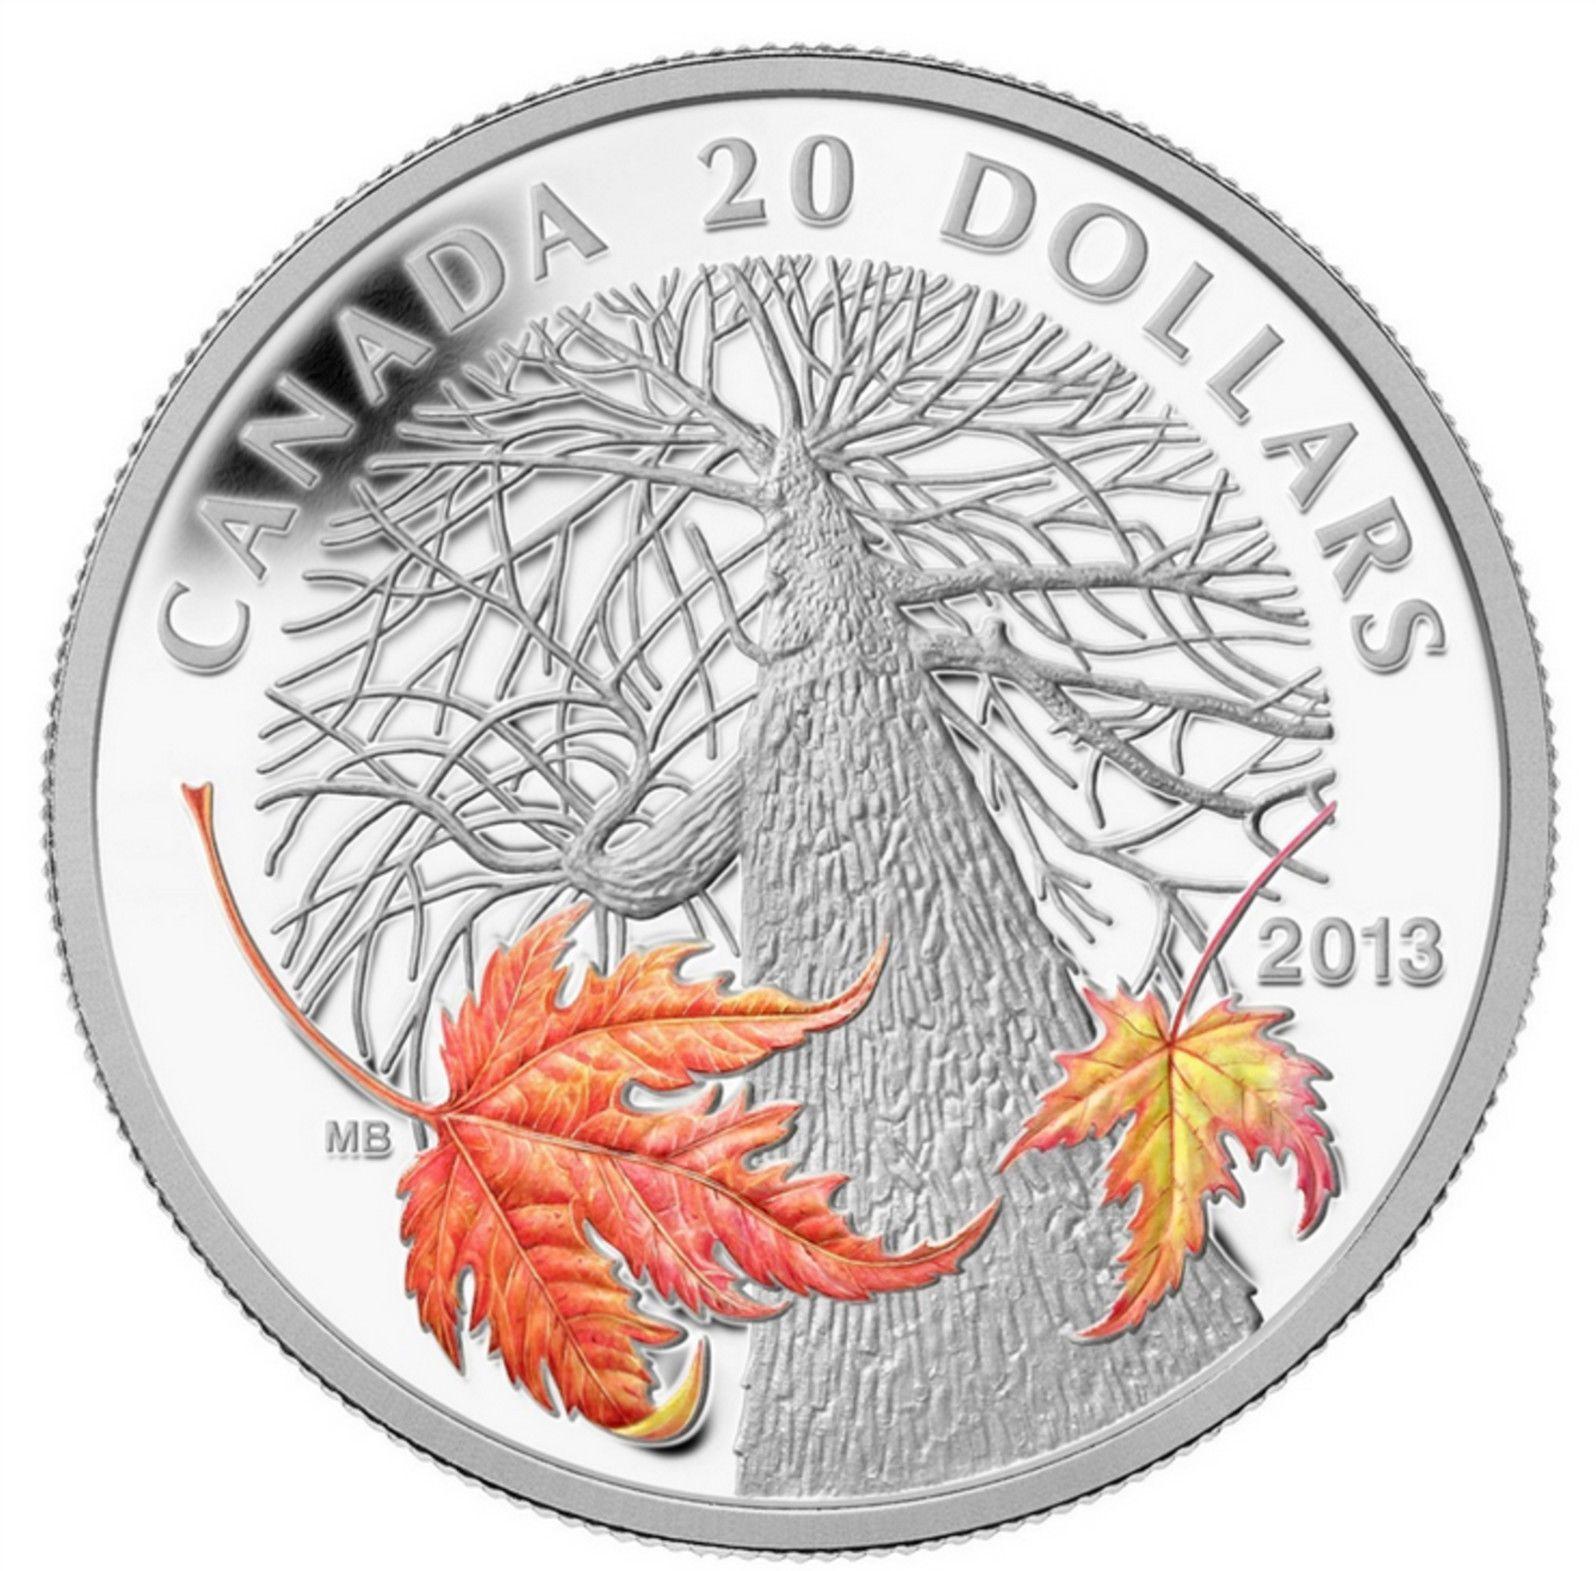 2013 Canada Autumn Maple Canopy B - 2013 Canada $20 Autumn Maple Canopy Silver Coin